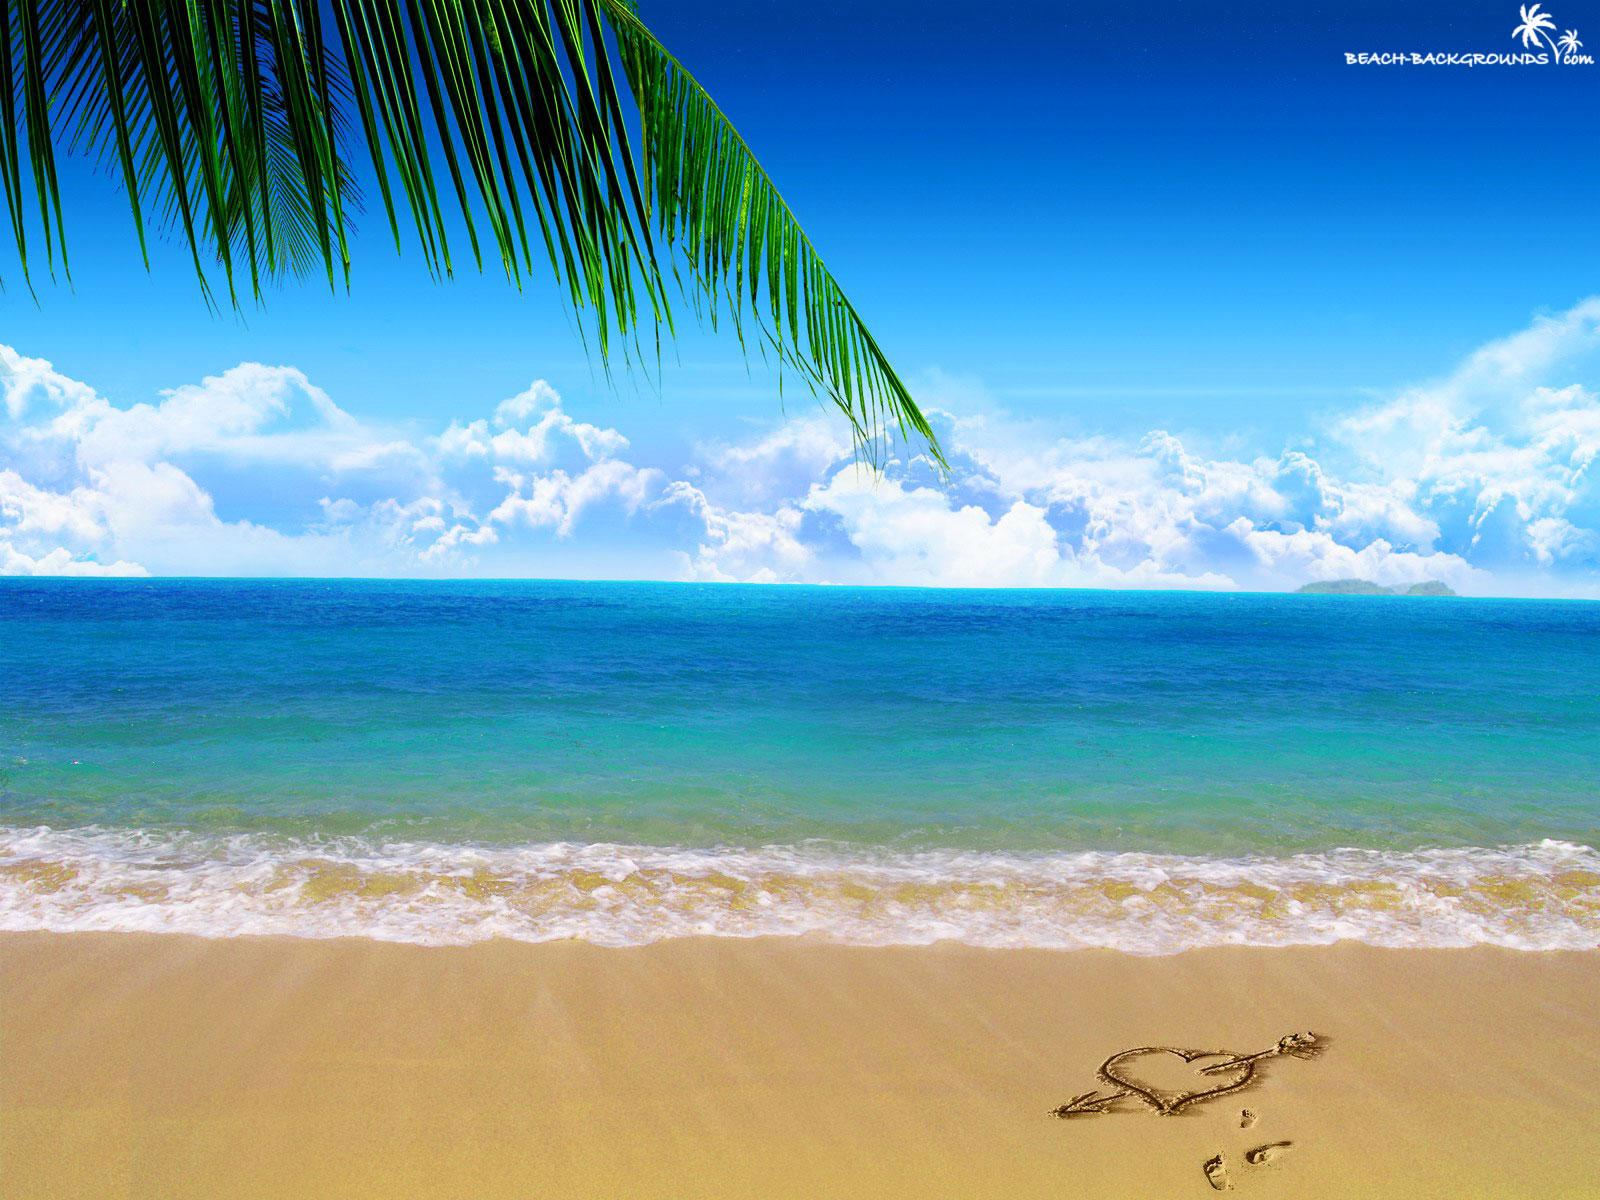 http://2.bp.blogspot.com/-eX0gKbBDPX8/T0dXCl2uZkI/AAAAAAAAAh8/MYKXBROkoh4/s1600/love-heart-on-beach-sand-1600x1200.jpg